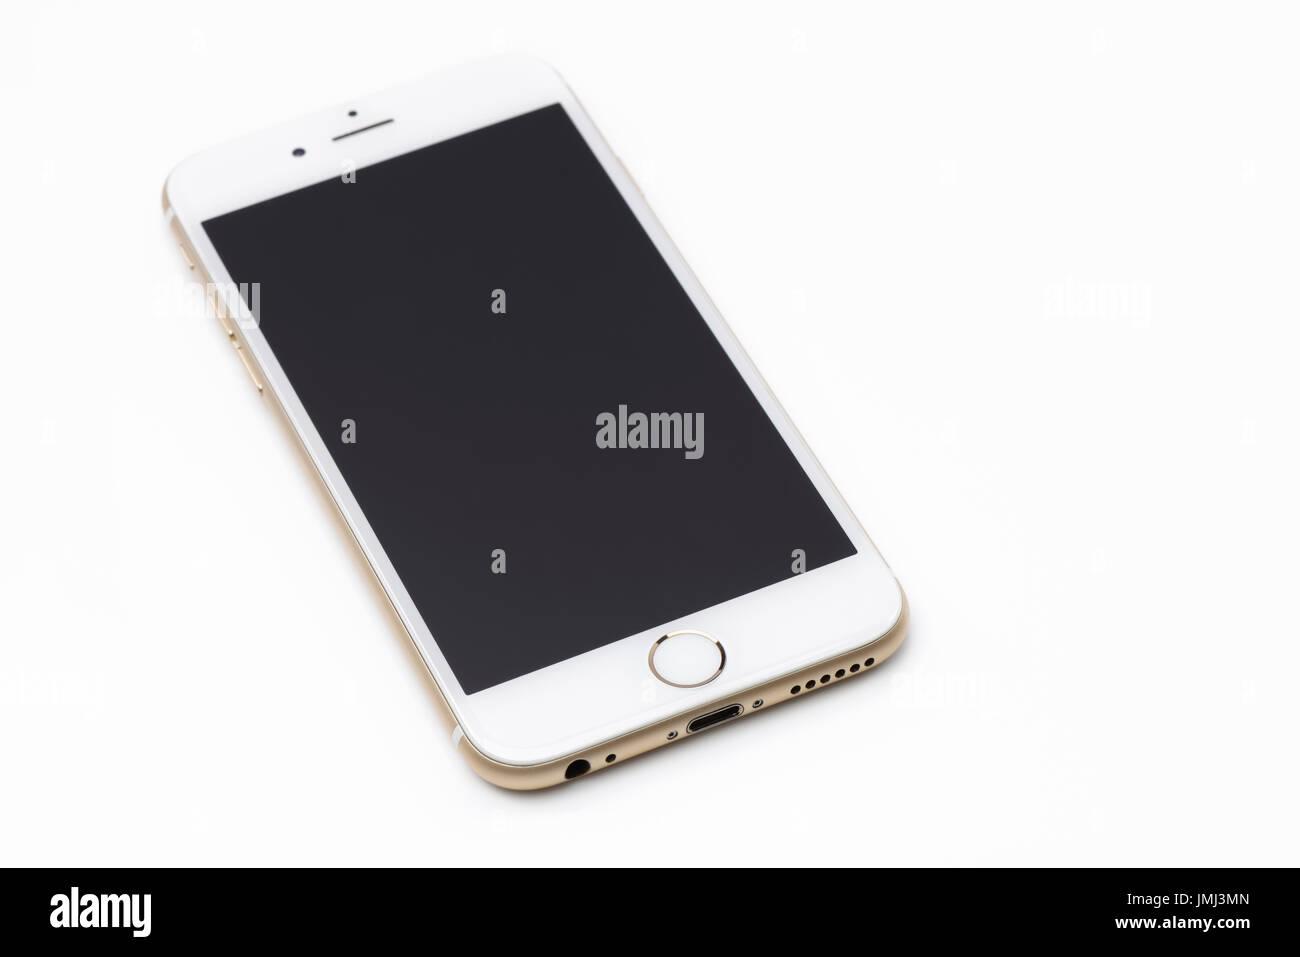 Oro Bianco Apple Iphone 6 6s Con Vuoto Display Nero Giacente Isolati